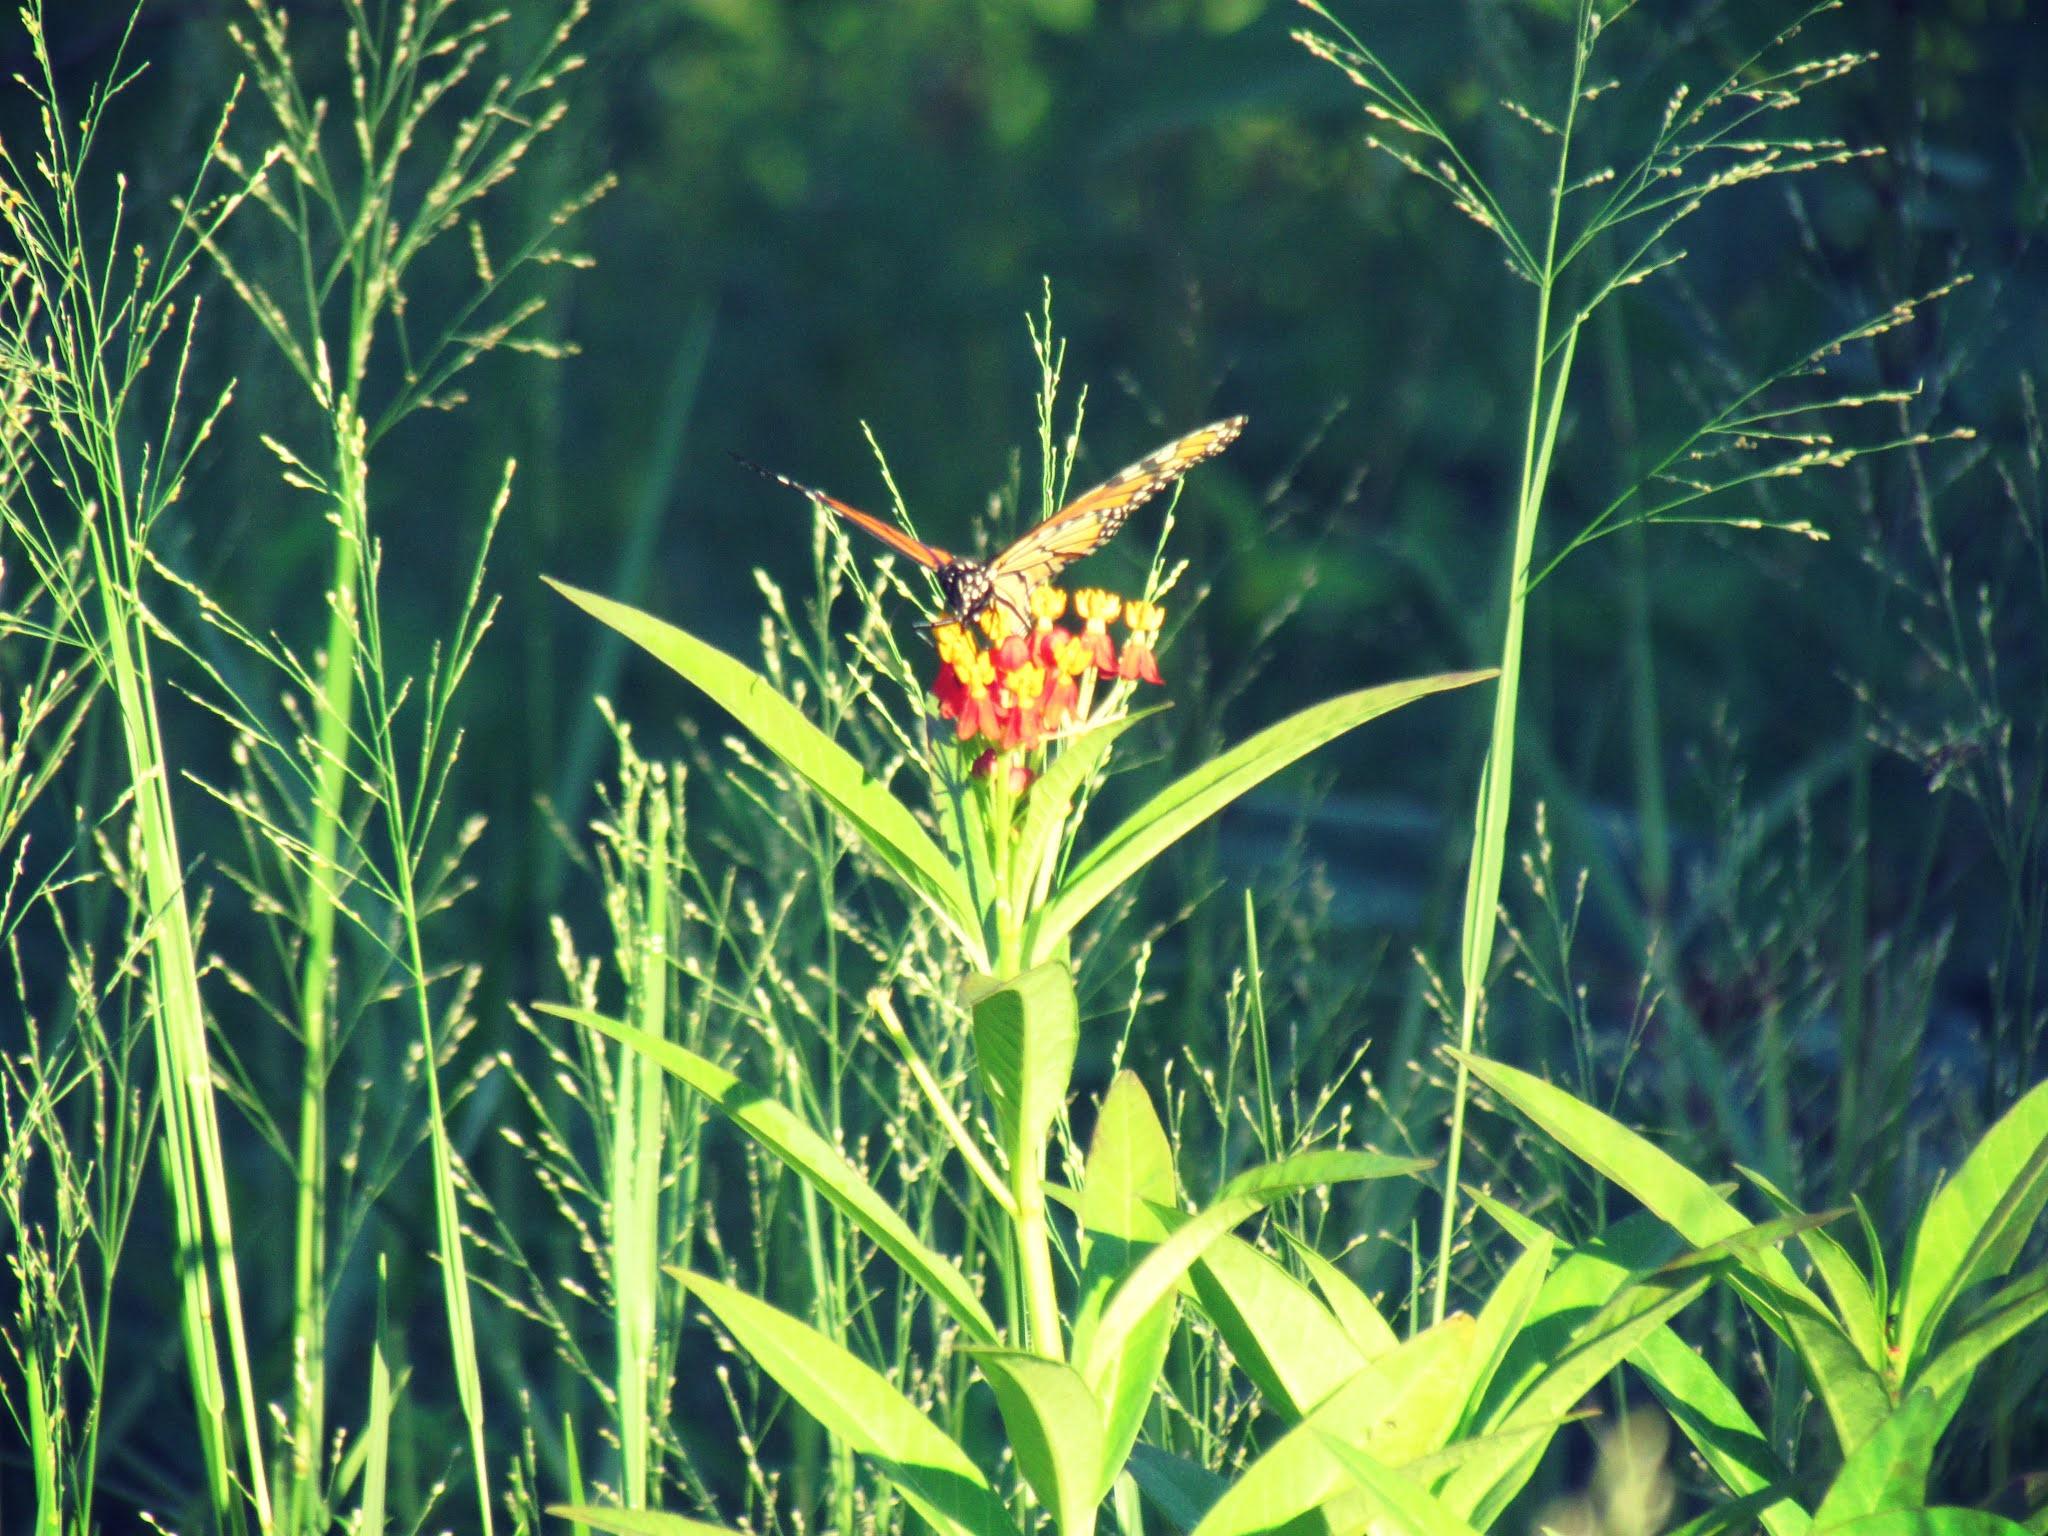 Where the butterflies roam wild and free in Hammock Park Butterfly Garden in Dunedin, Florida